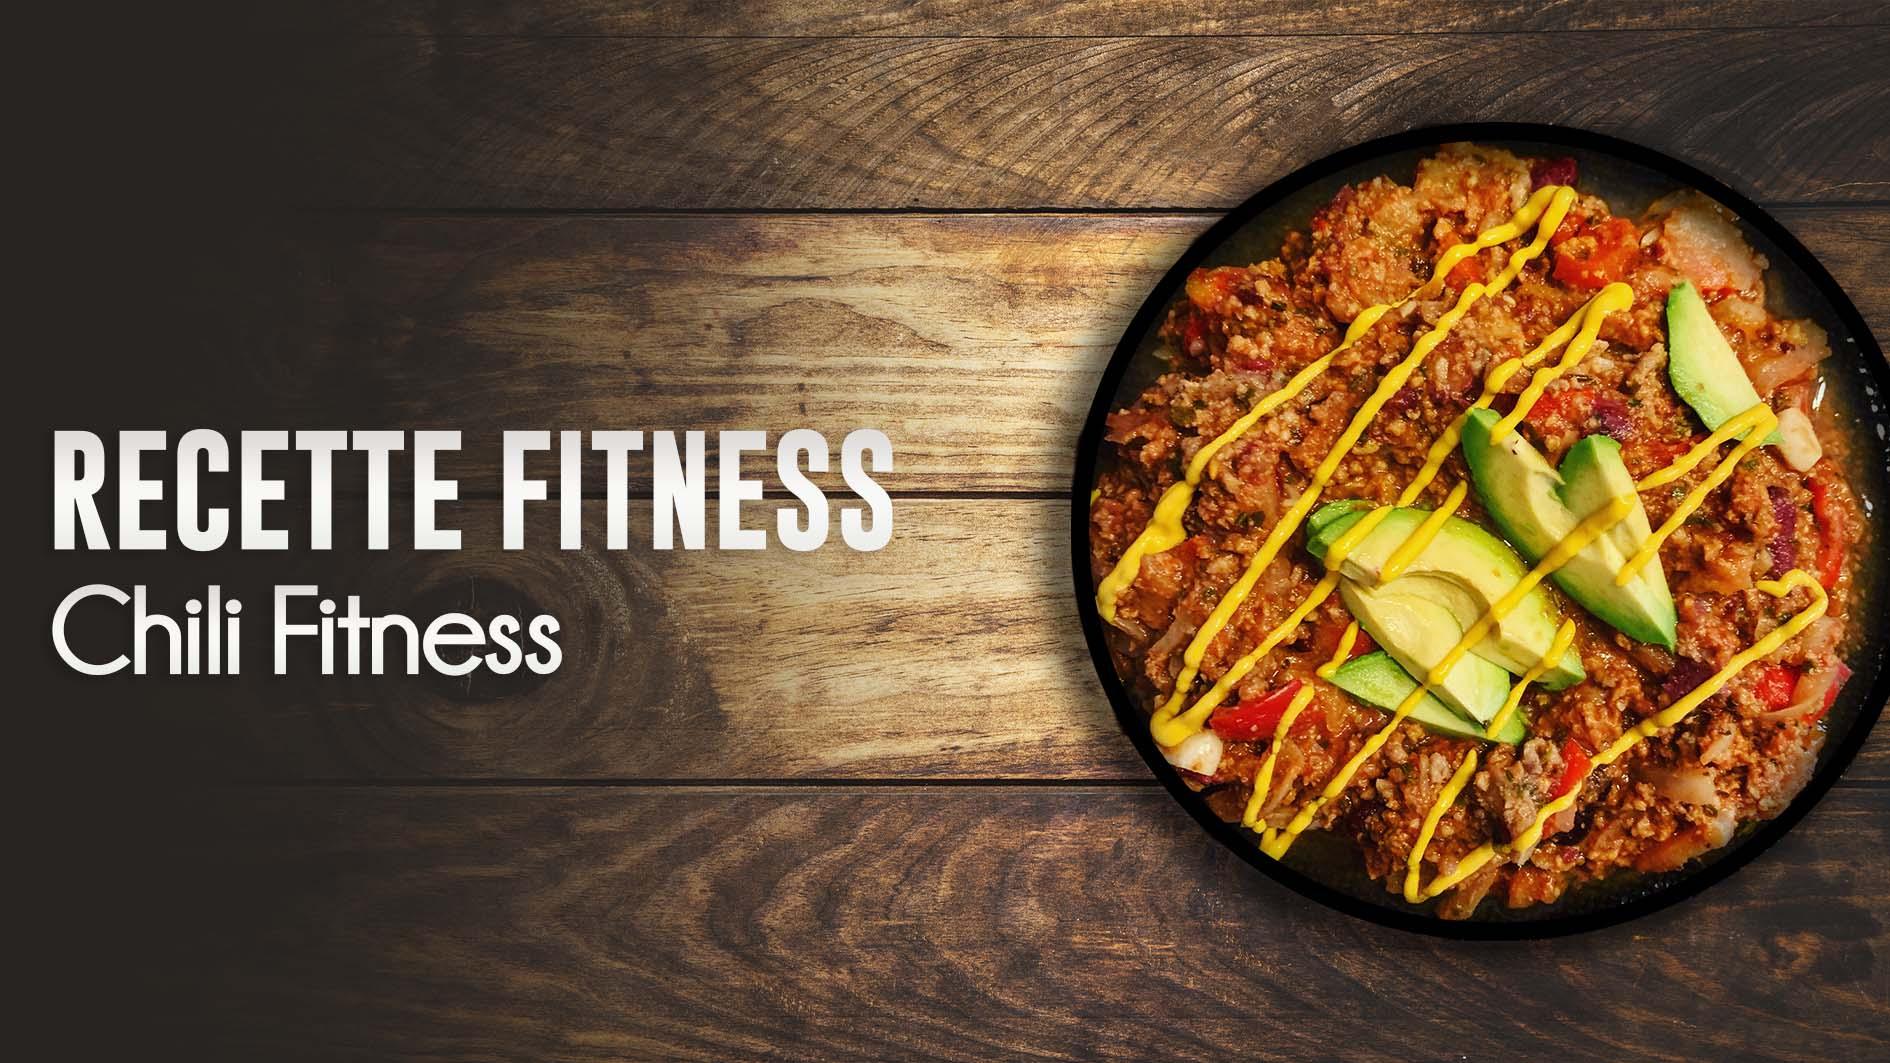 recette fitness du chili